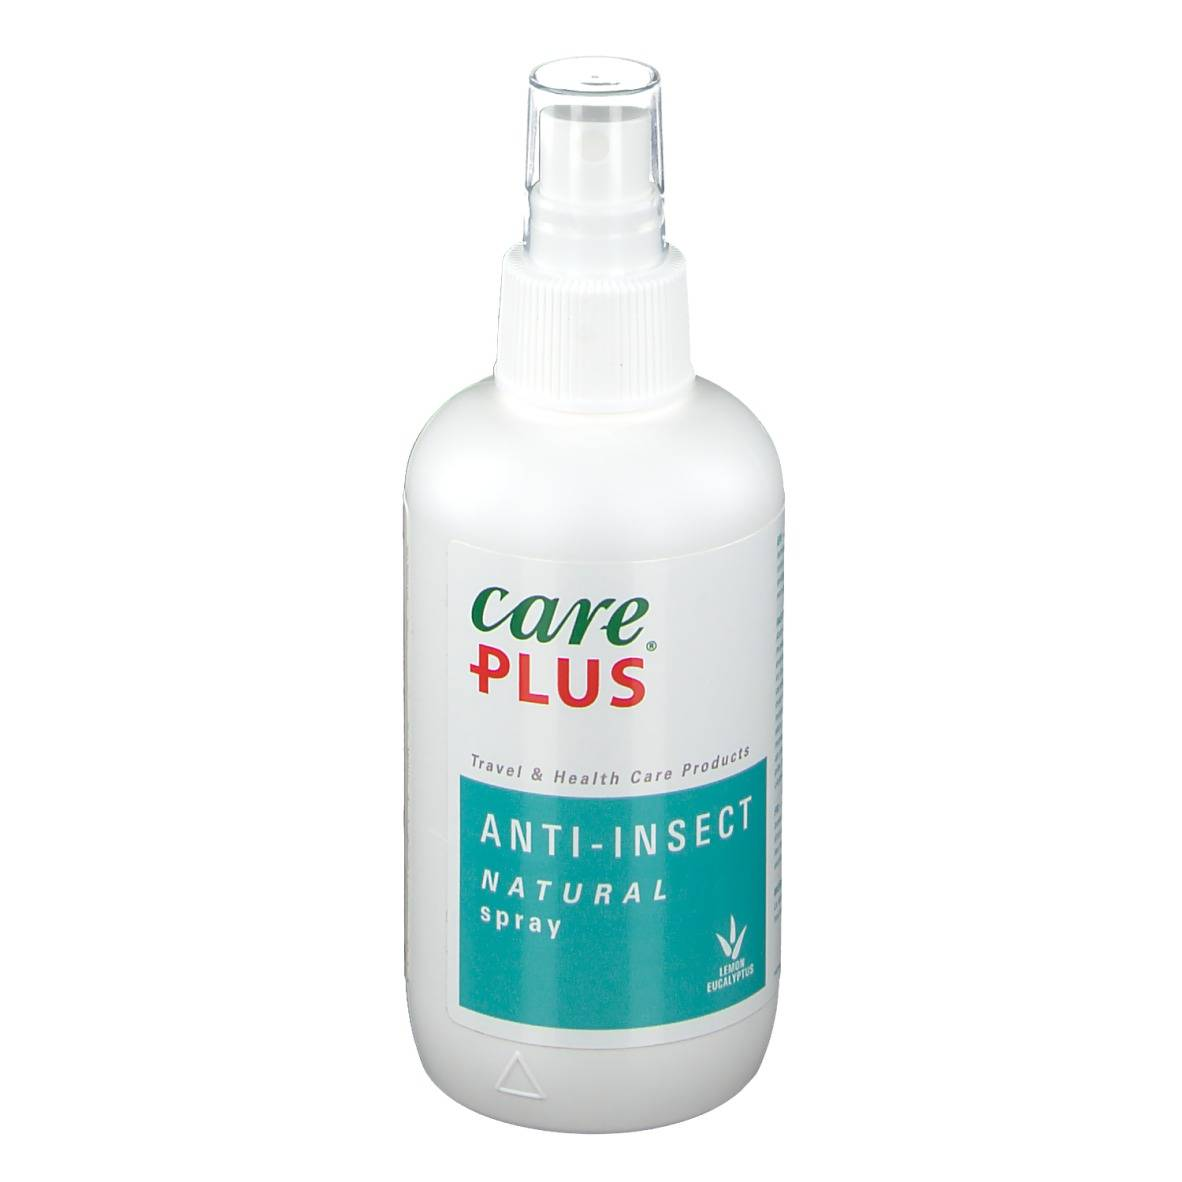 PatchPharma care PLUS® Anti-Insecte vaporisateur Natural ml spray